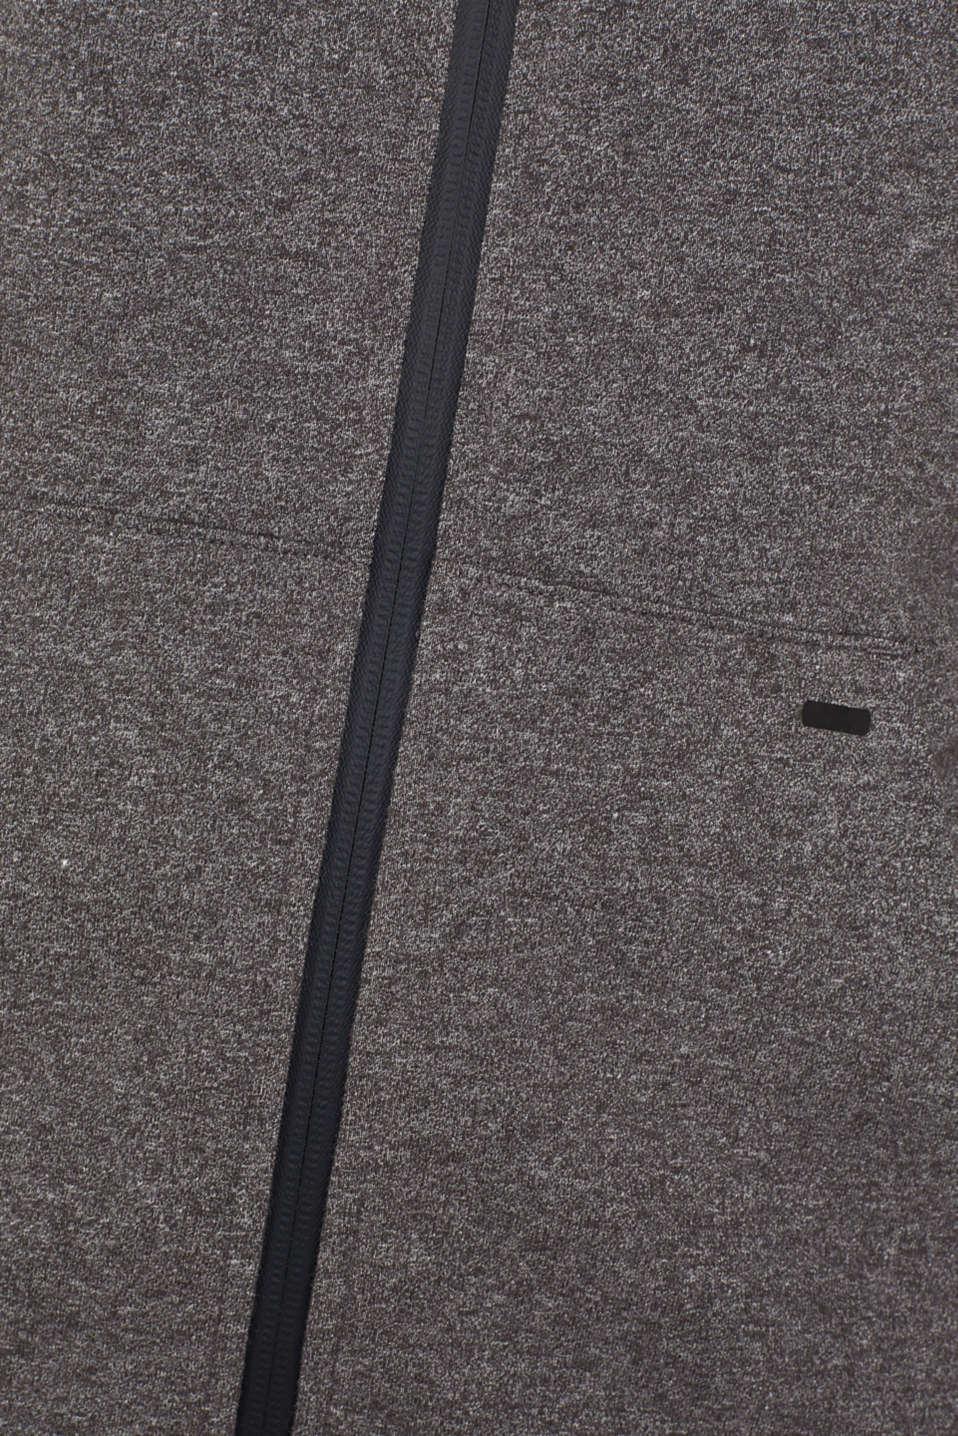 Hooded sweatshirt cardigan, ANTHRACITE 2, detail image number 3